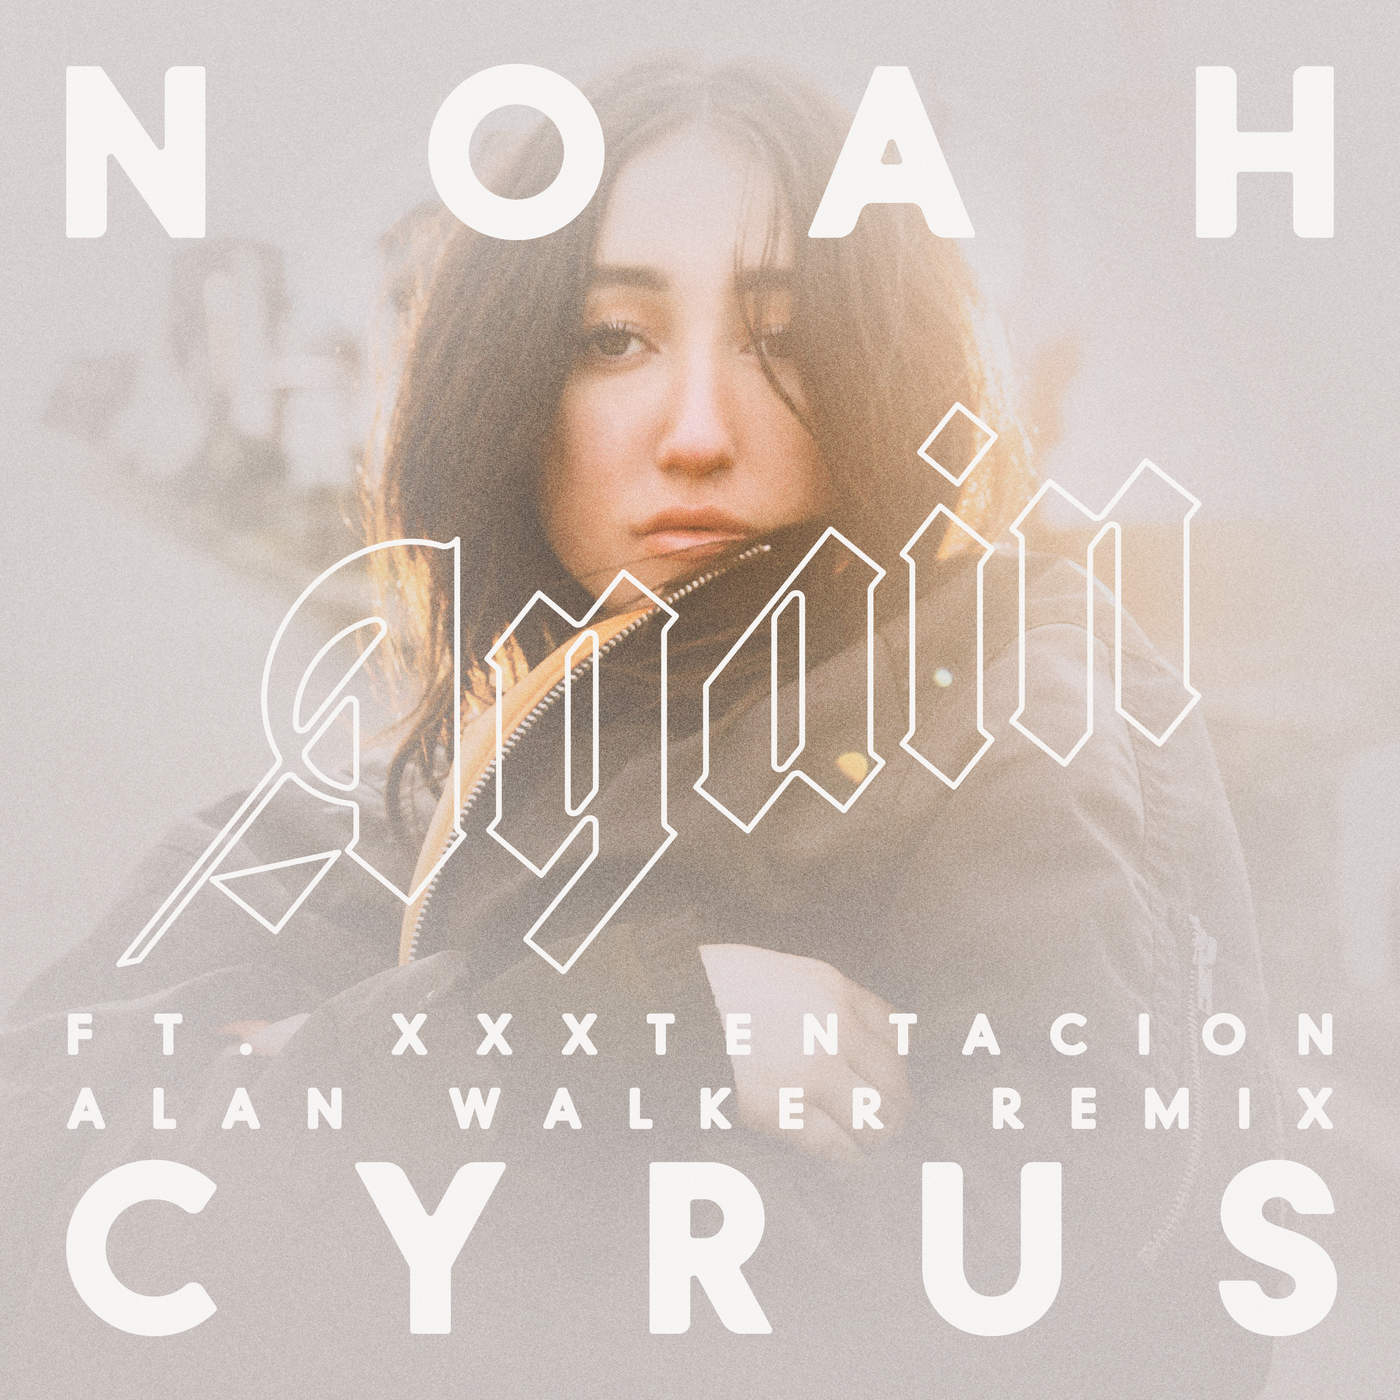 Noah Cyrus - Again (feat. XXXTENTACION) [Alan Walker Remix] - Single Cover